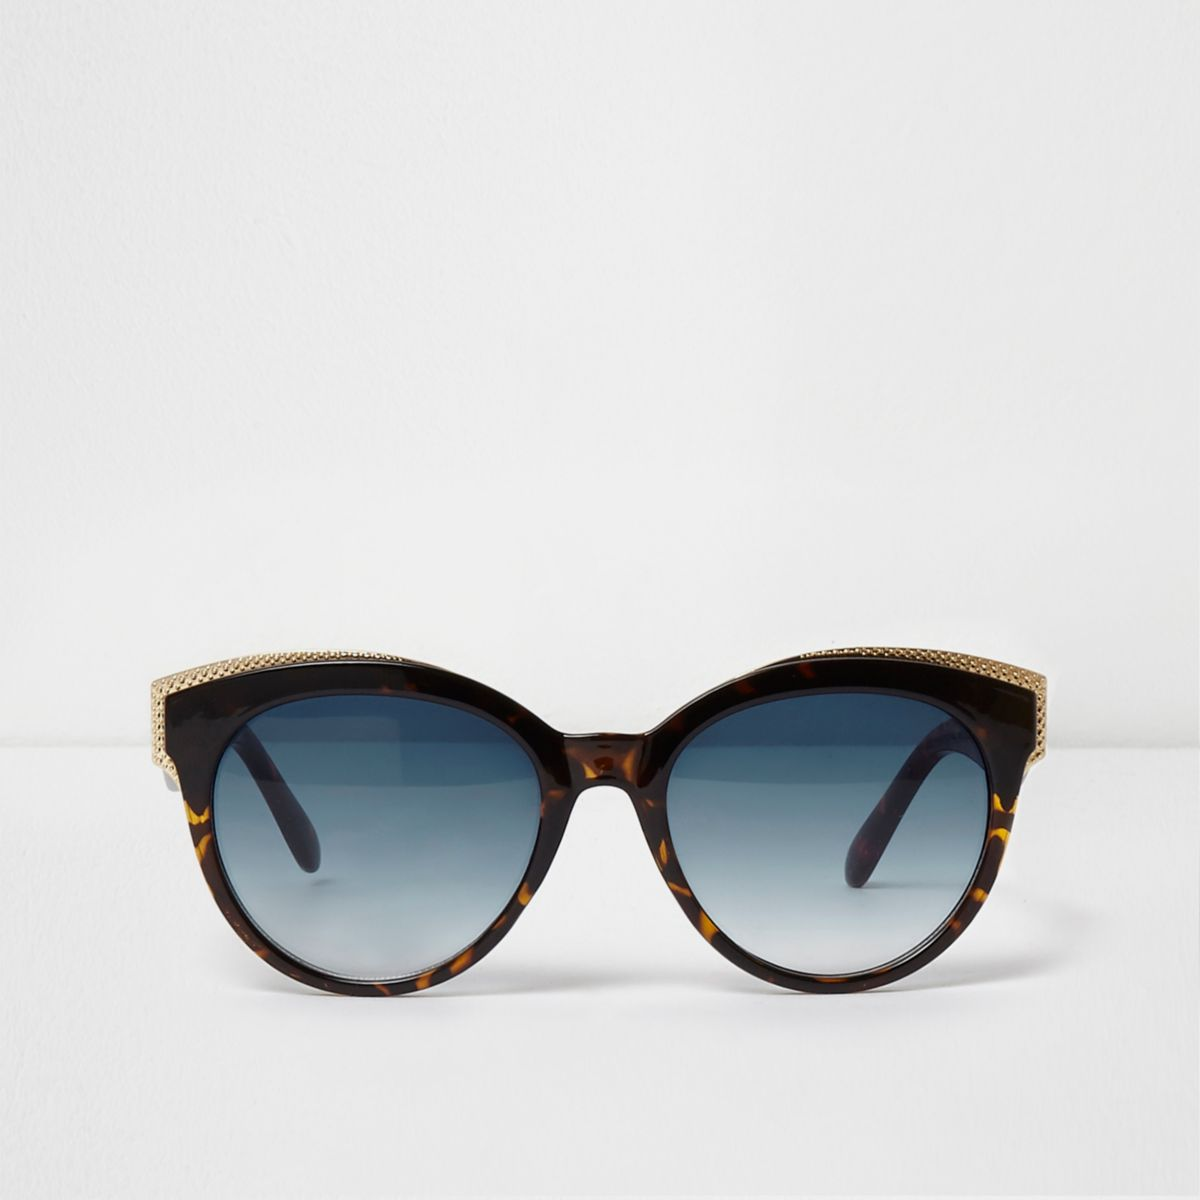 Brown tortoiseshell gold tone trim sunglasses